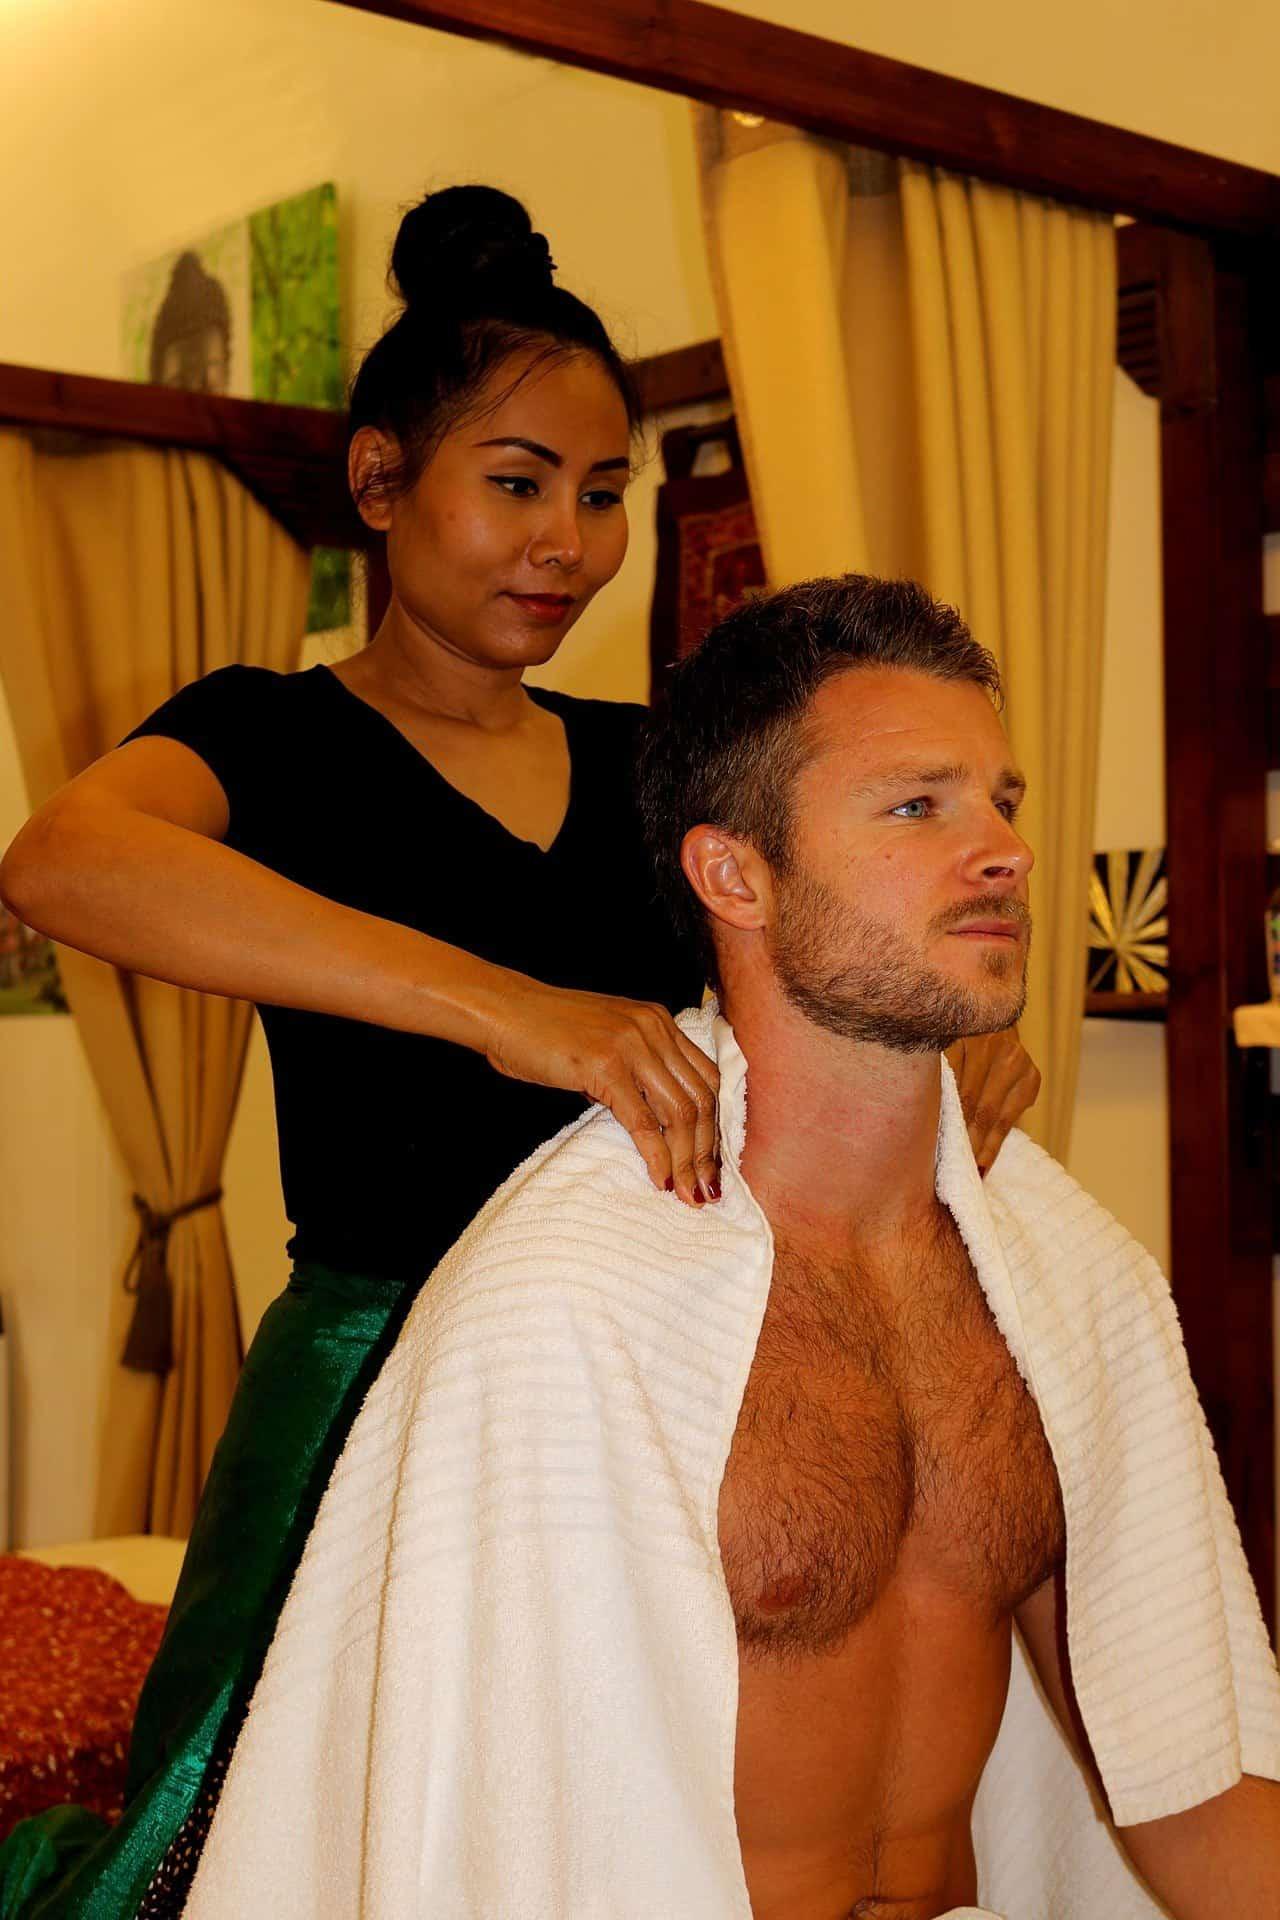 woman giving a man a thai massage